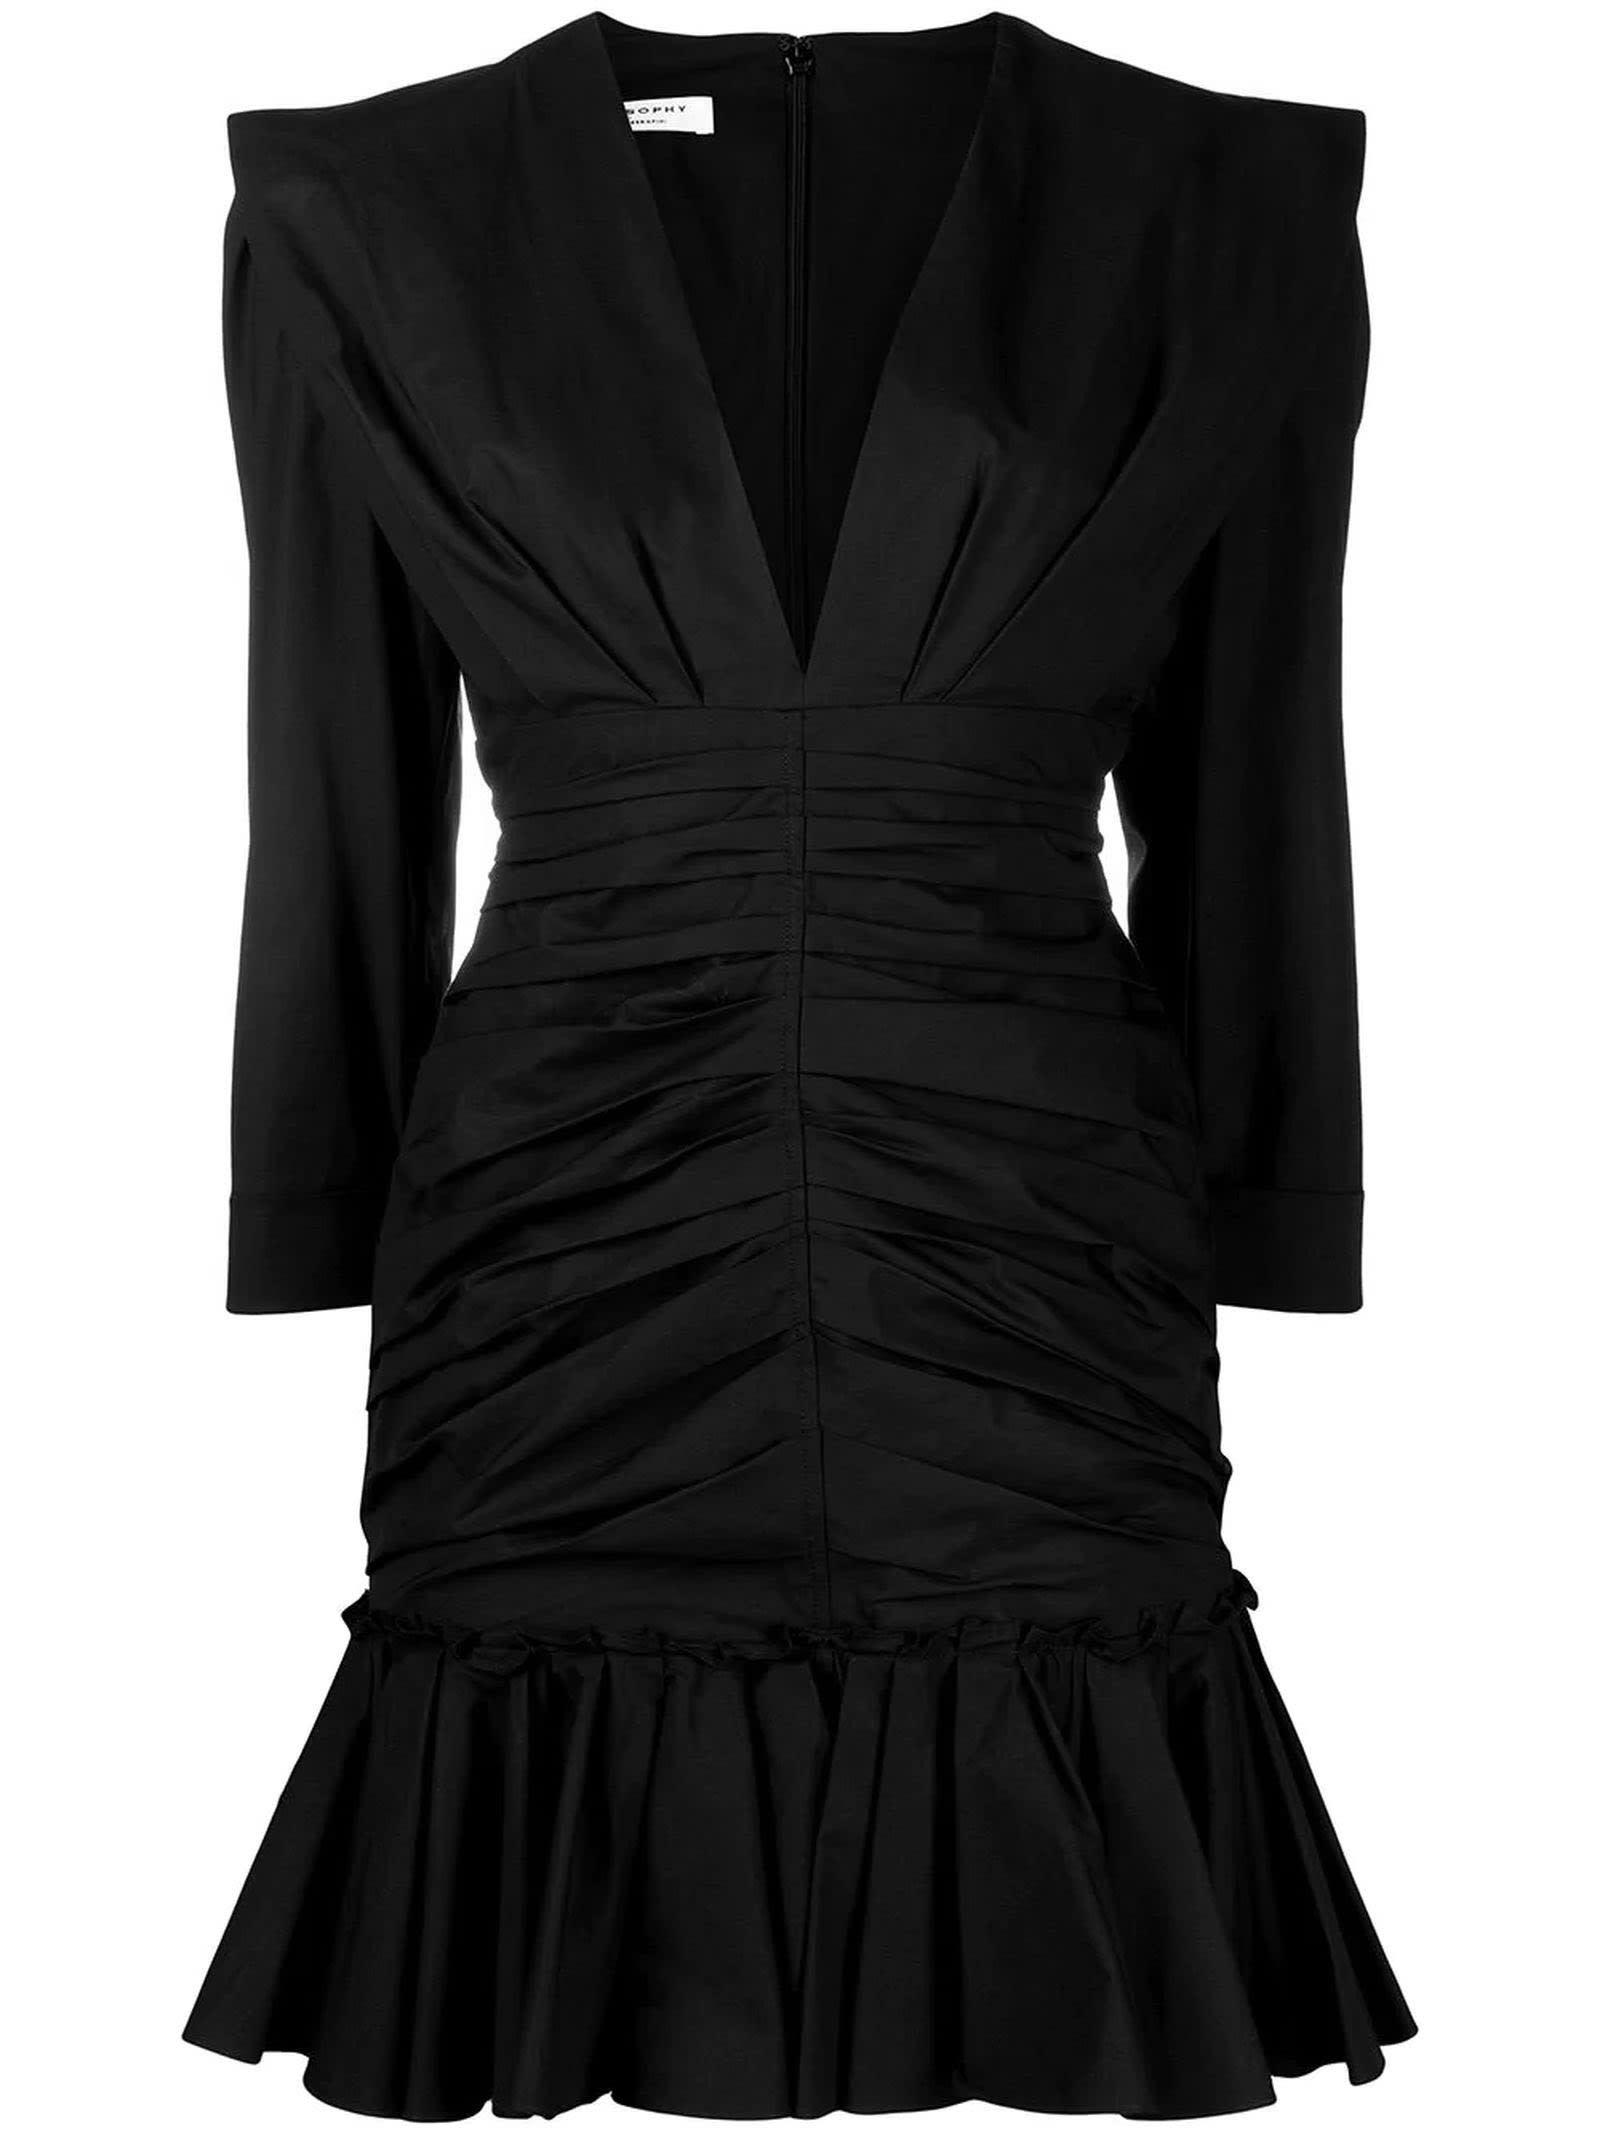 Buy Philosophy di Lorenzo Serafini Black Cotton Blend Dress online, shop Philosophy di Lorenzo Serafini with free shipping